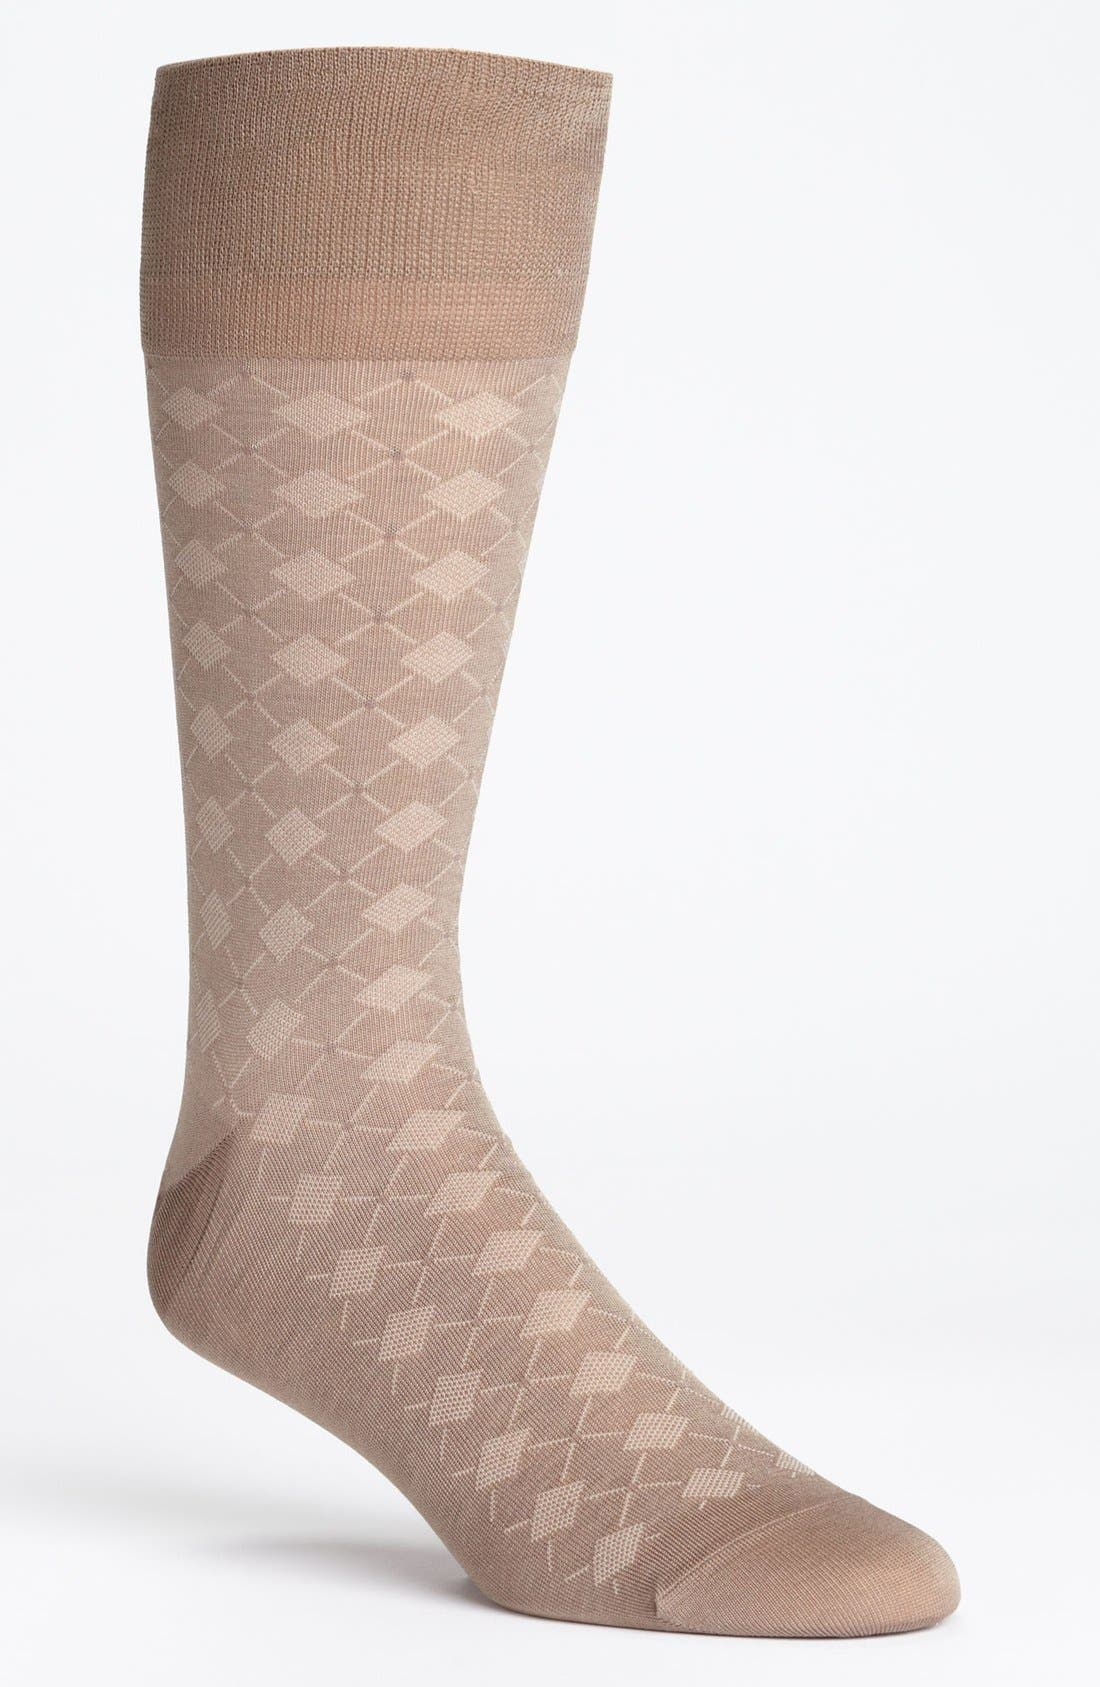 Alternate Image 1 Selected - John W. Nordstrom® Diamond Pattern Socks